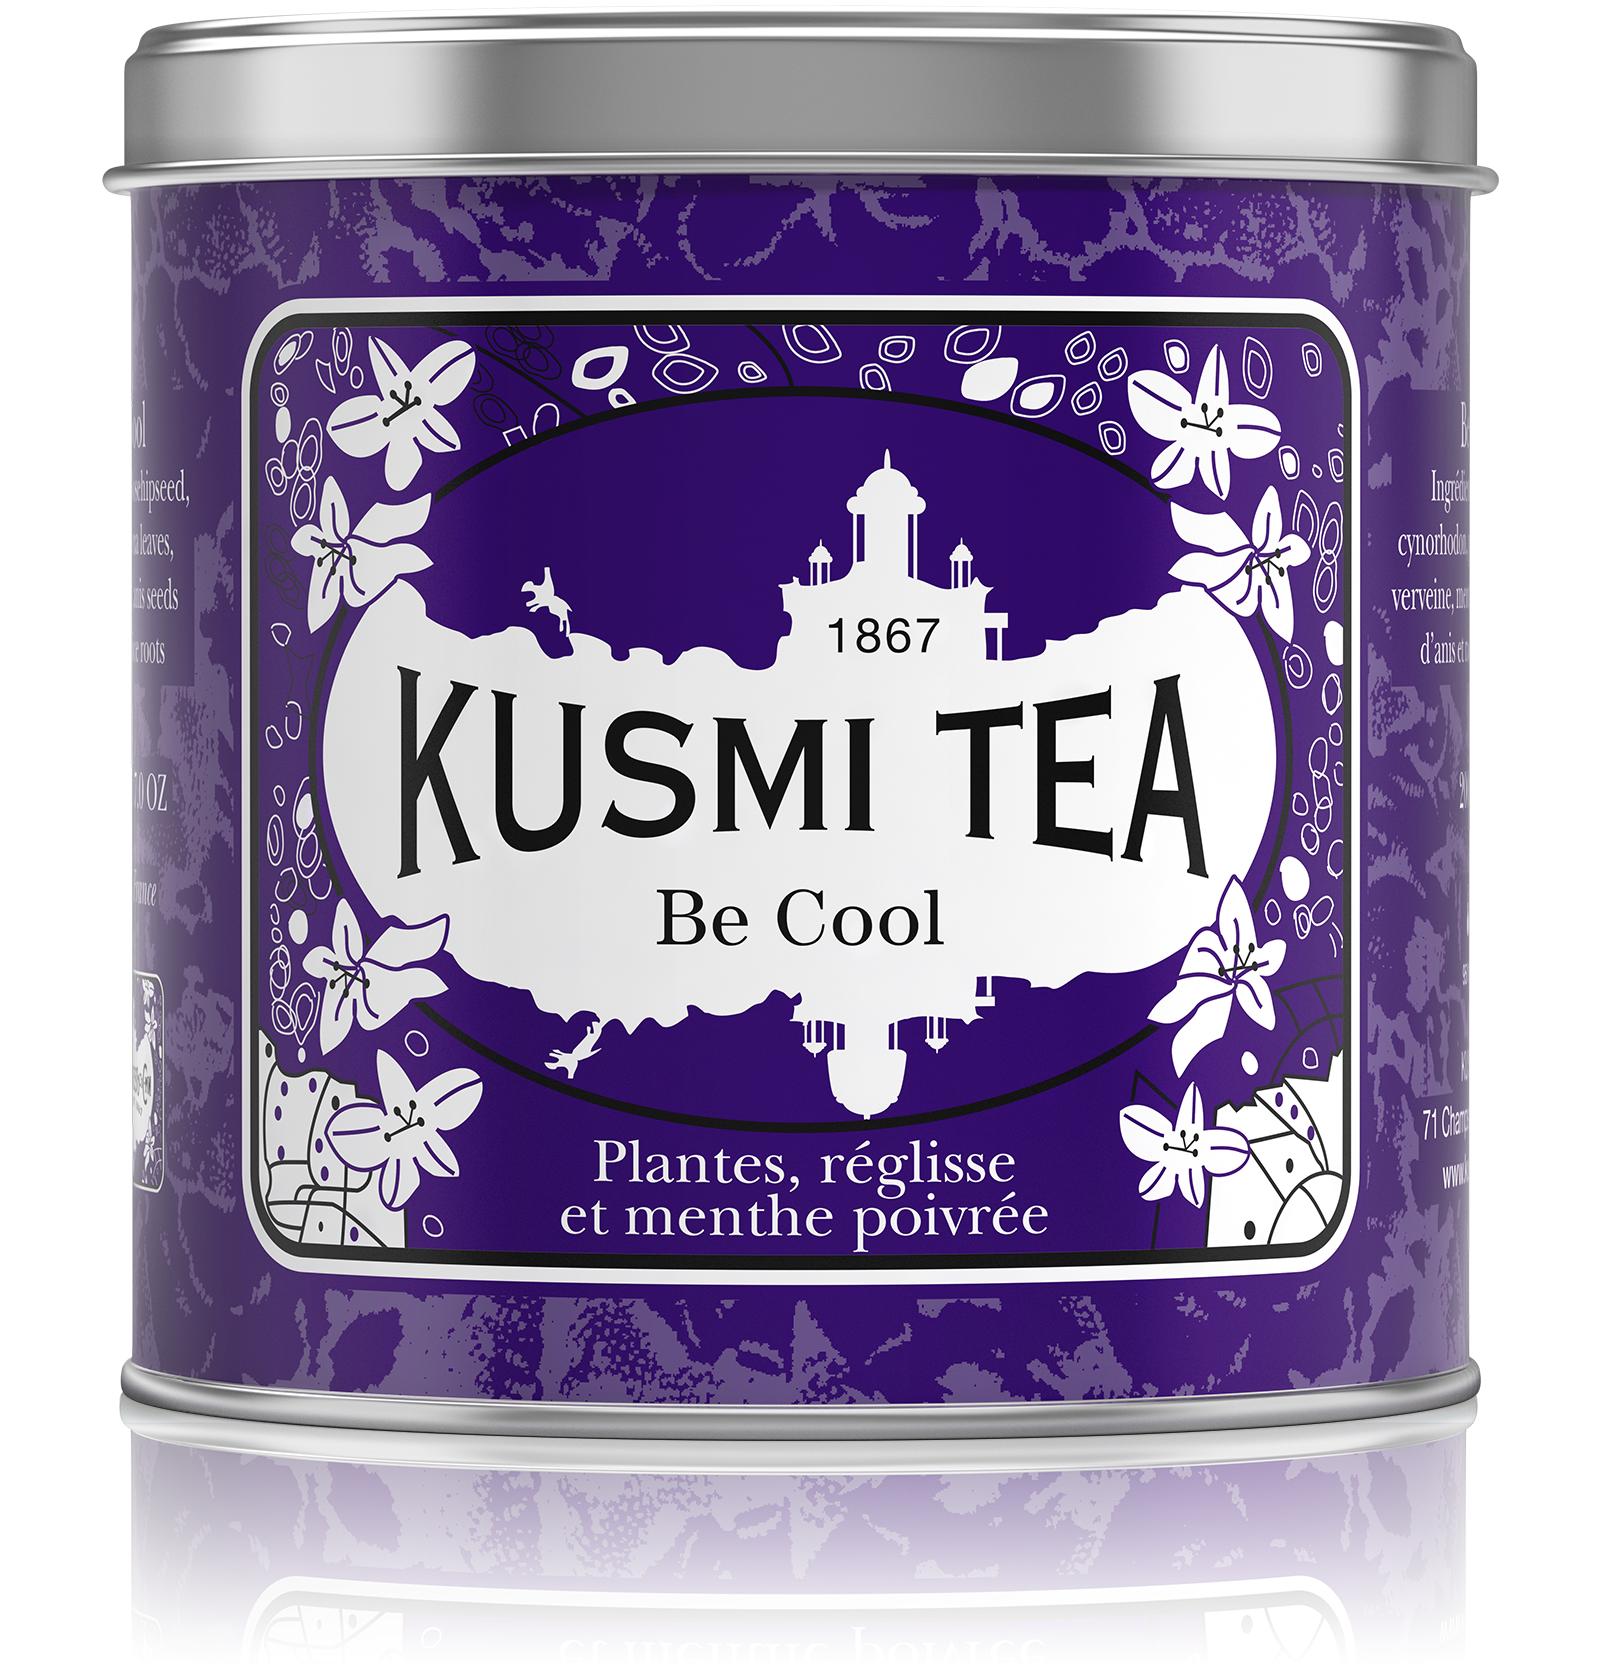 KUSMI TEA Be Cool Kusmi Tea